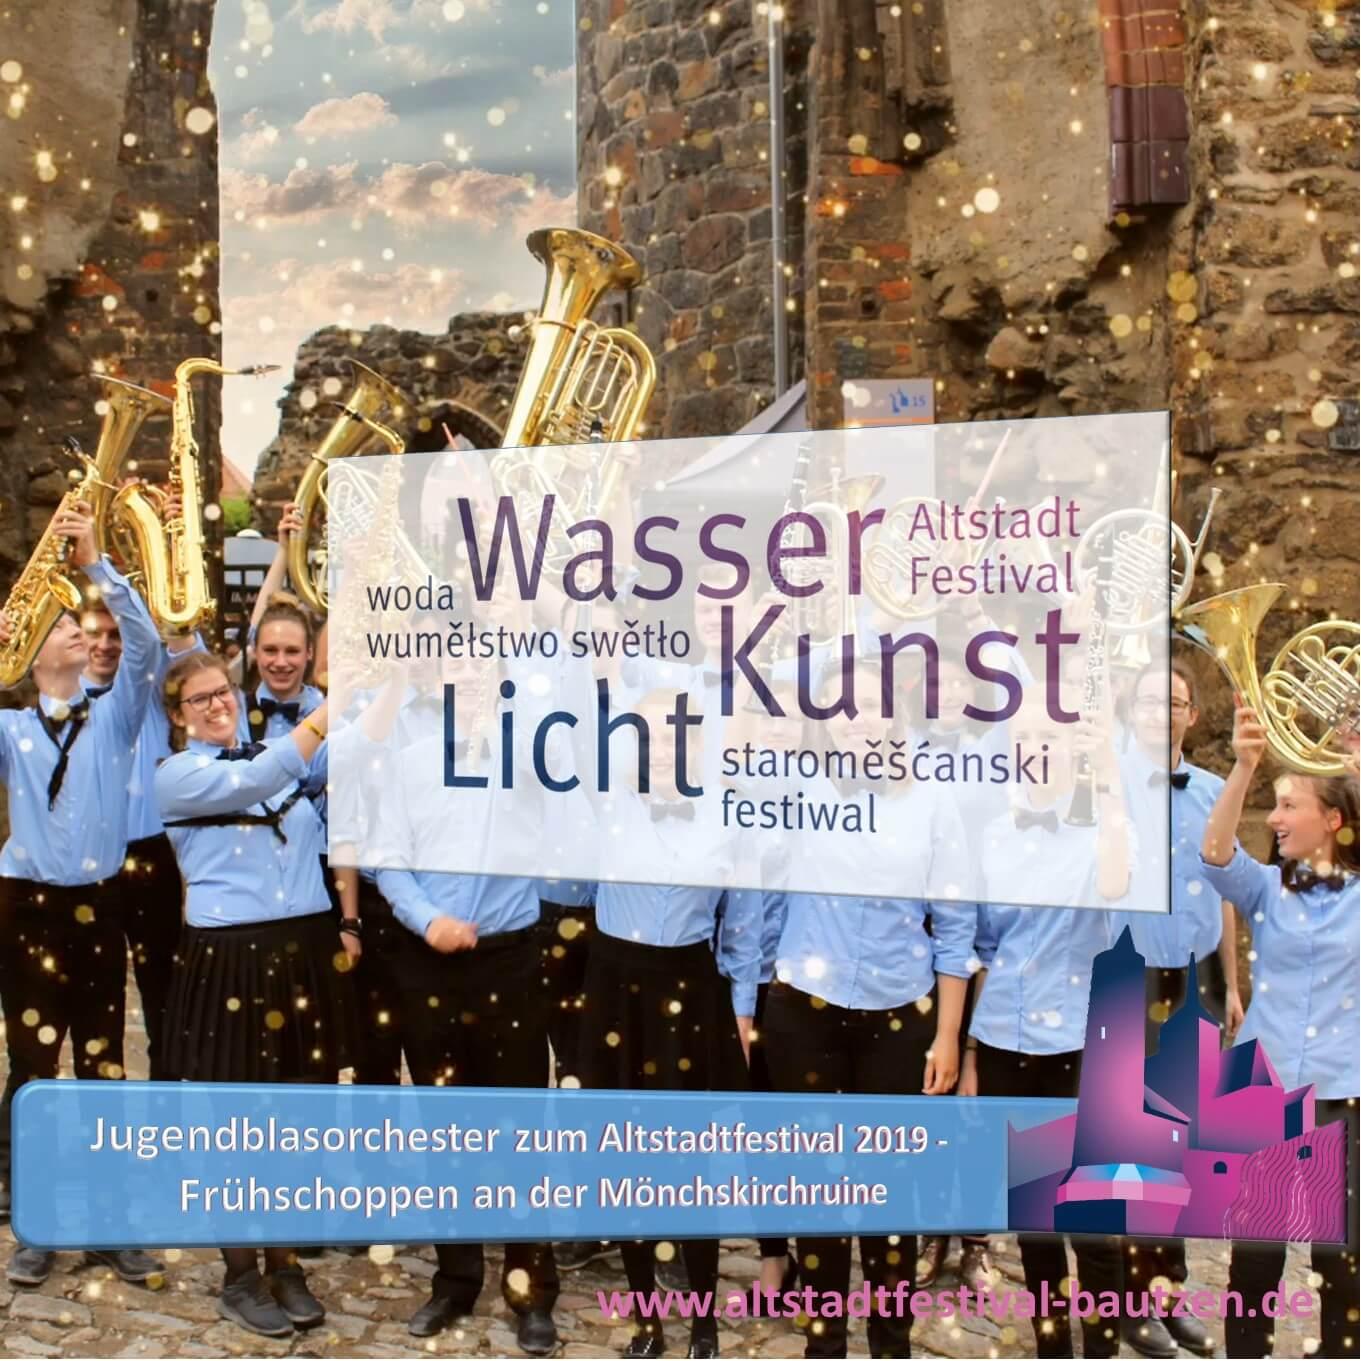 Beitrag Jugend Blasorchester zum Altstadtfestival 2019